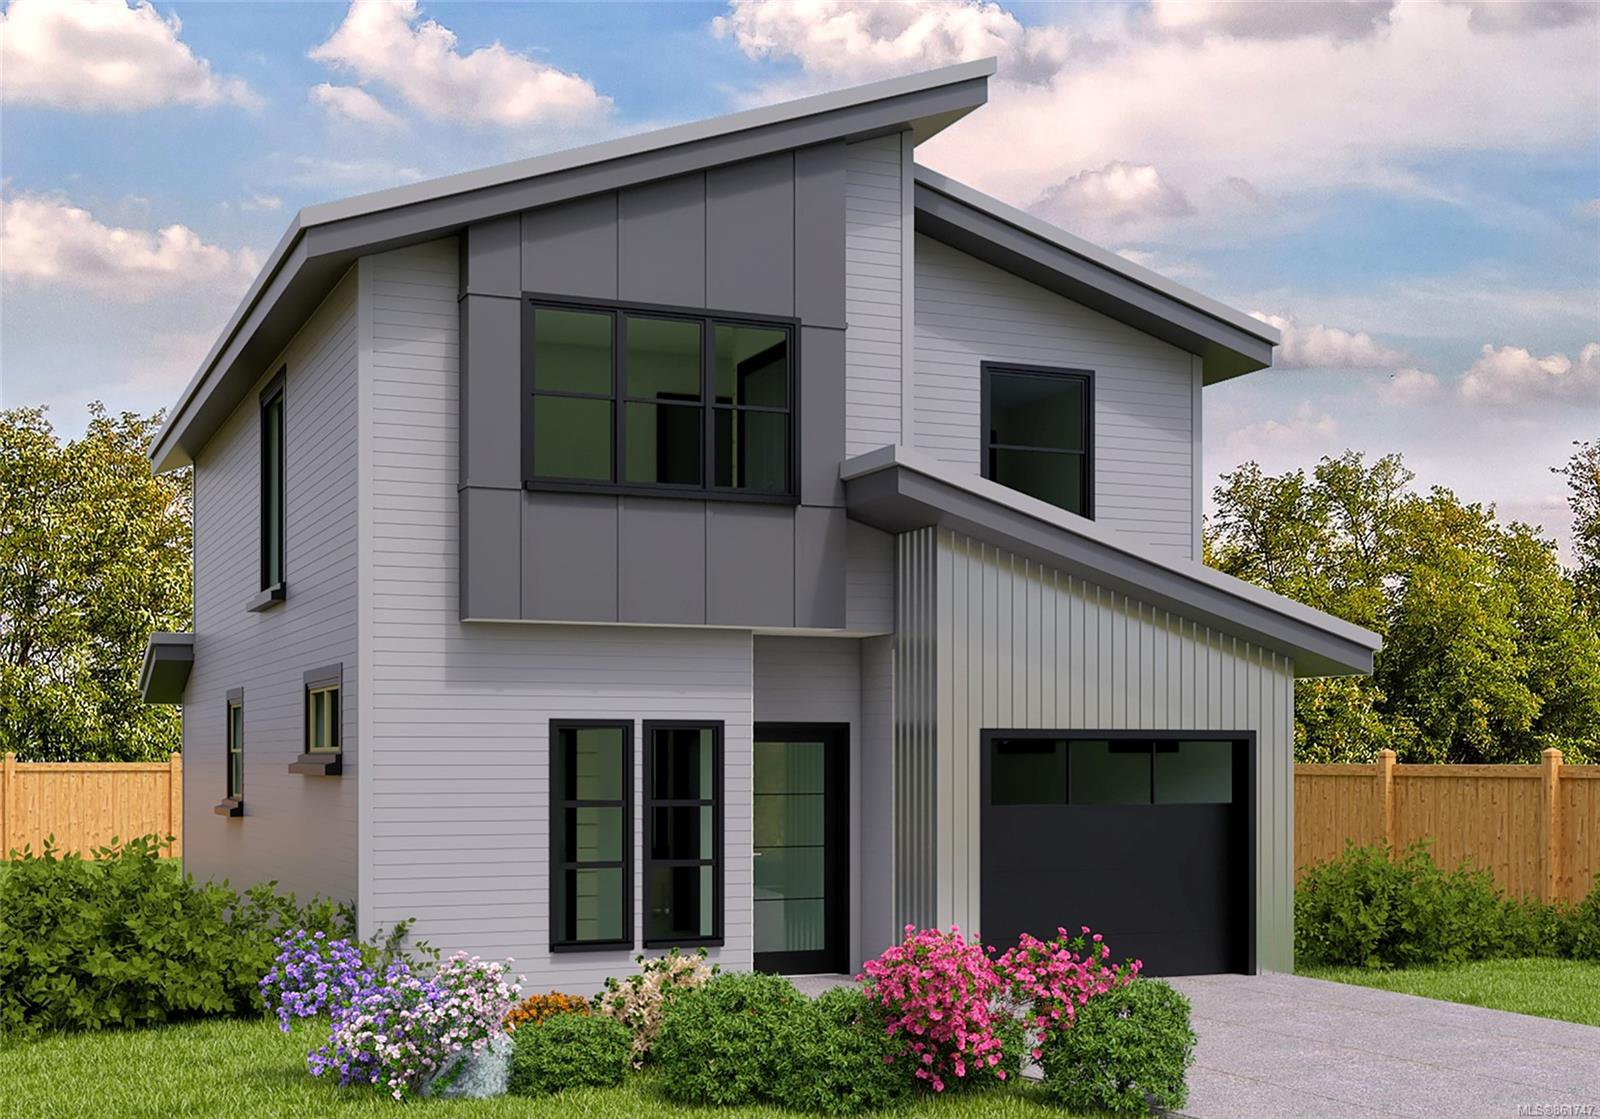 Main Photo: 126 1051 Shawnigan Lake Rd in : ML Shawnigan House for sale (Malahat & Area)  : MLS®# 861747